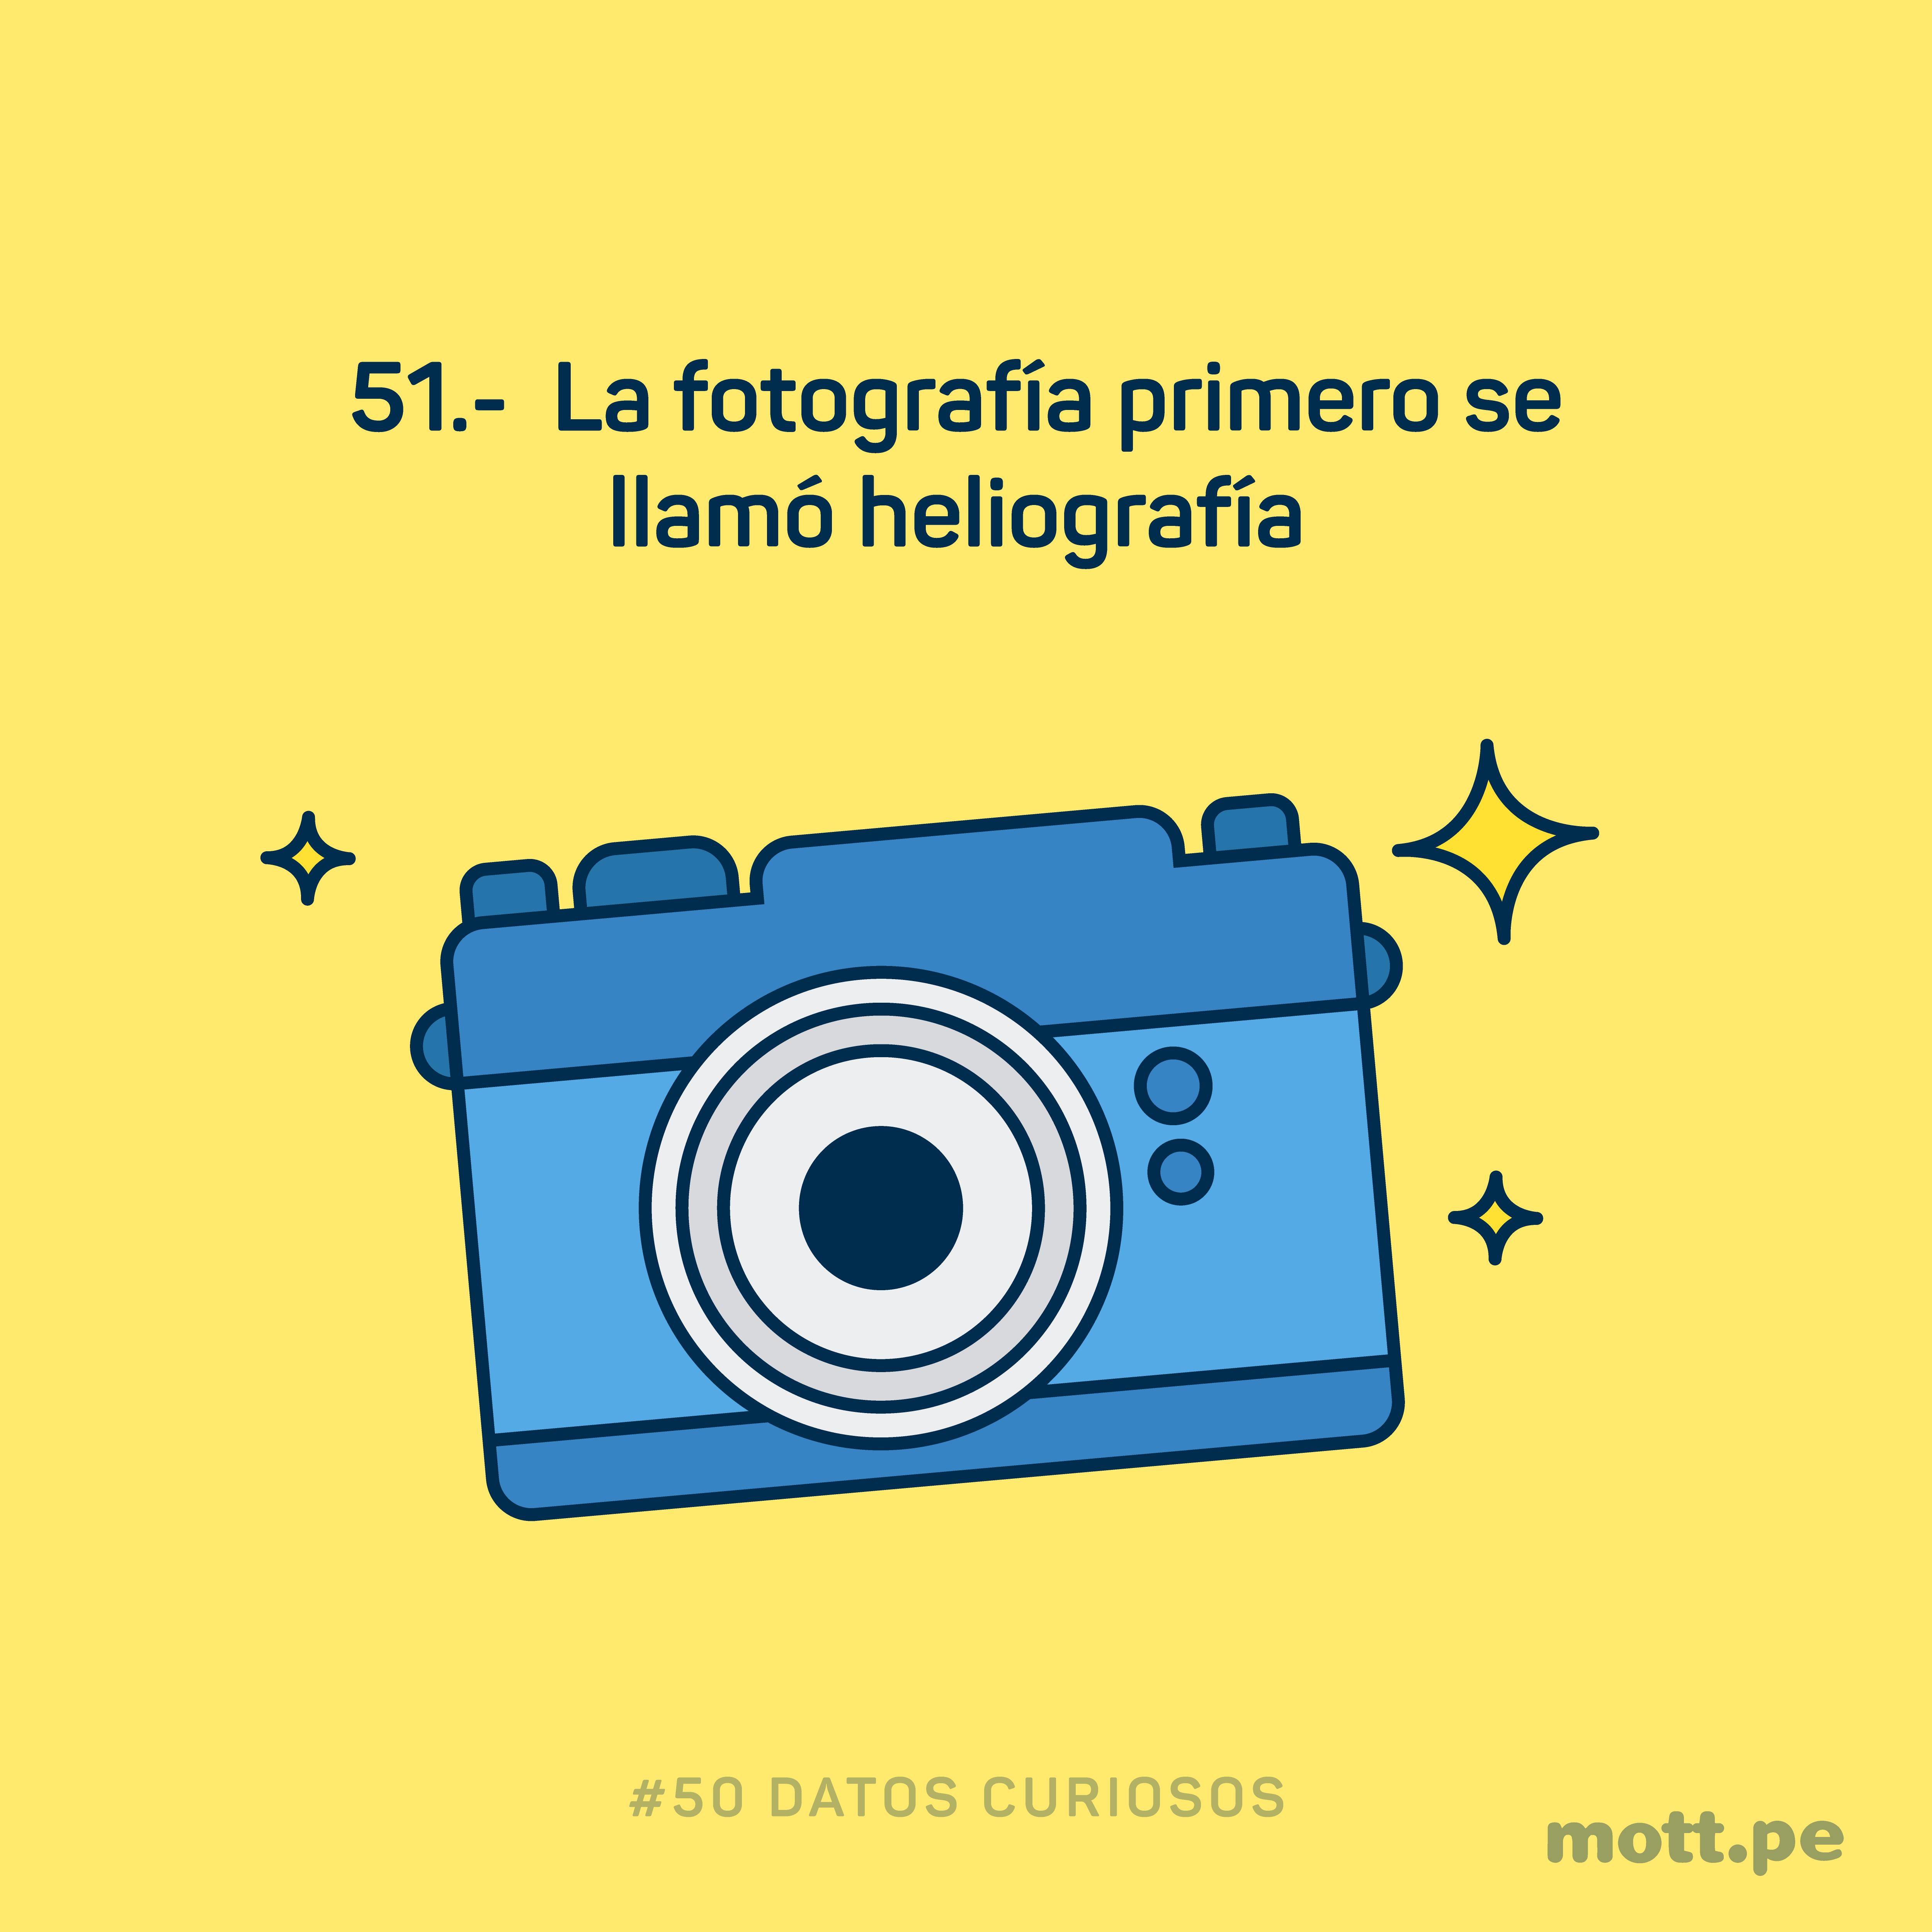 fotografia primero se llamo heliografia